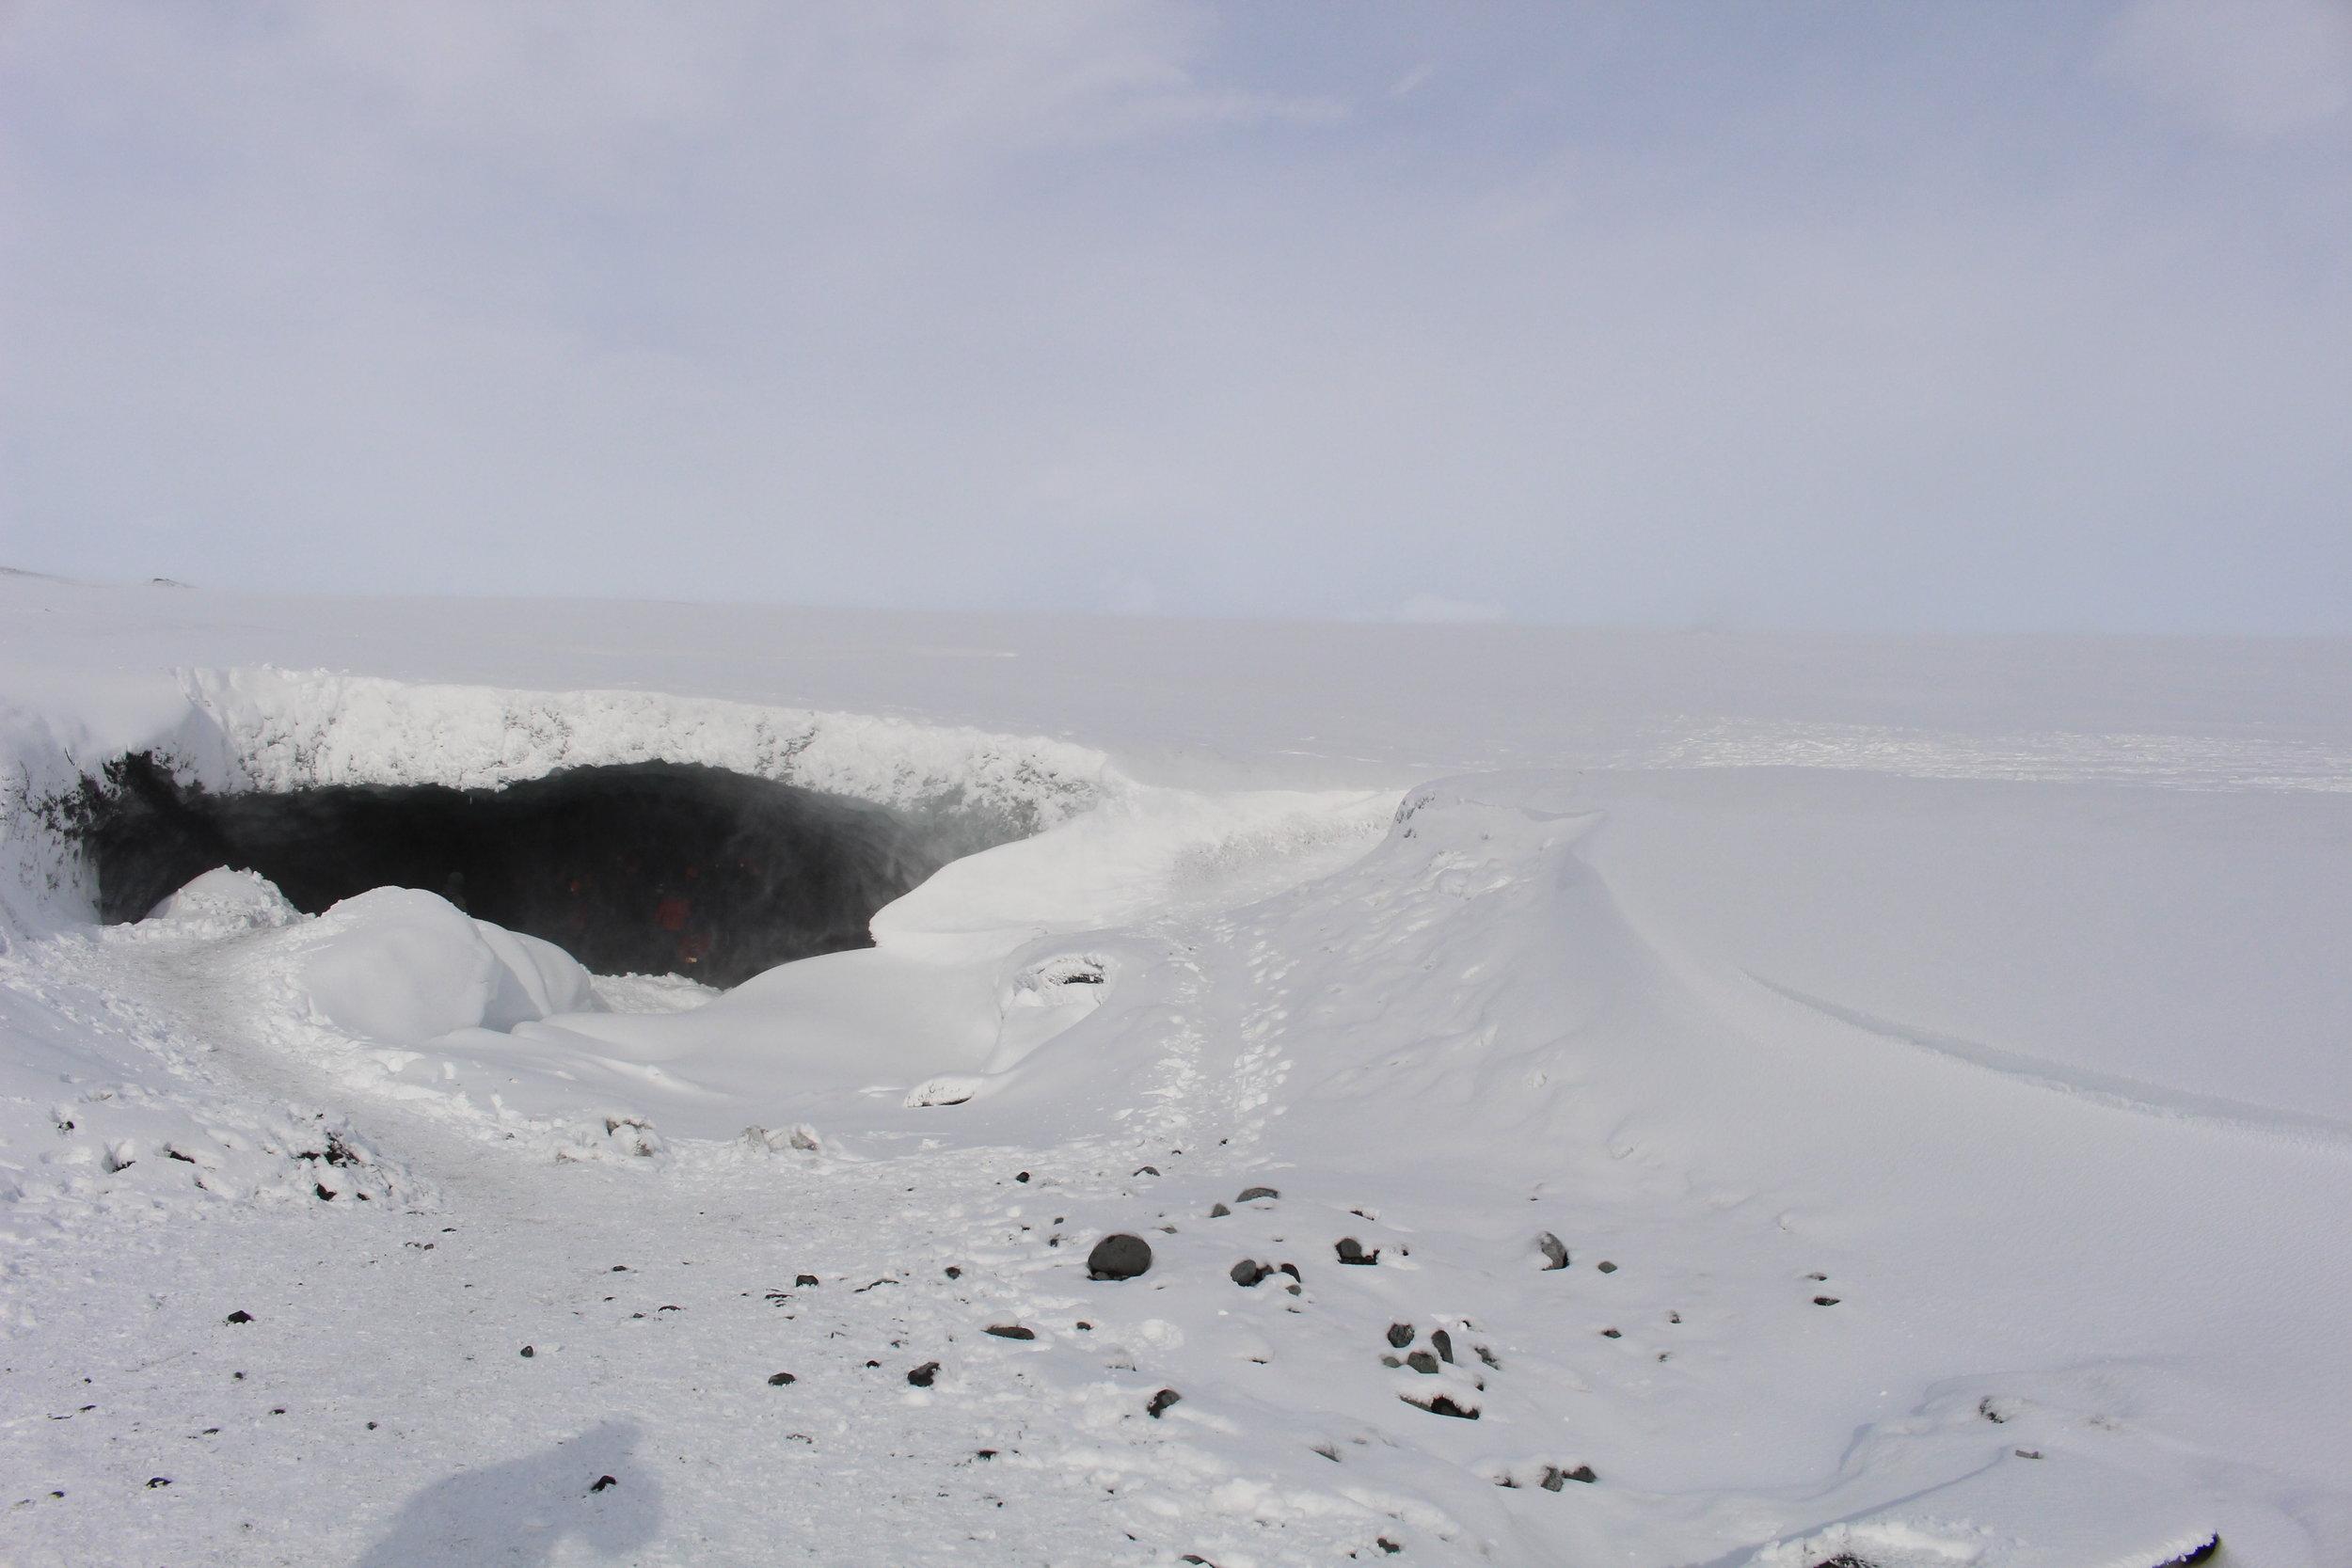 Mouth of Ice Cave, Breiðarmerkurjökull